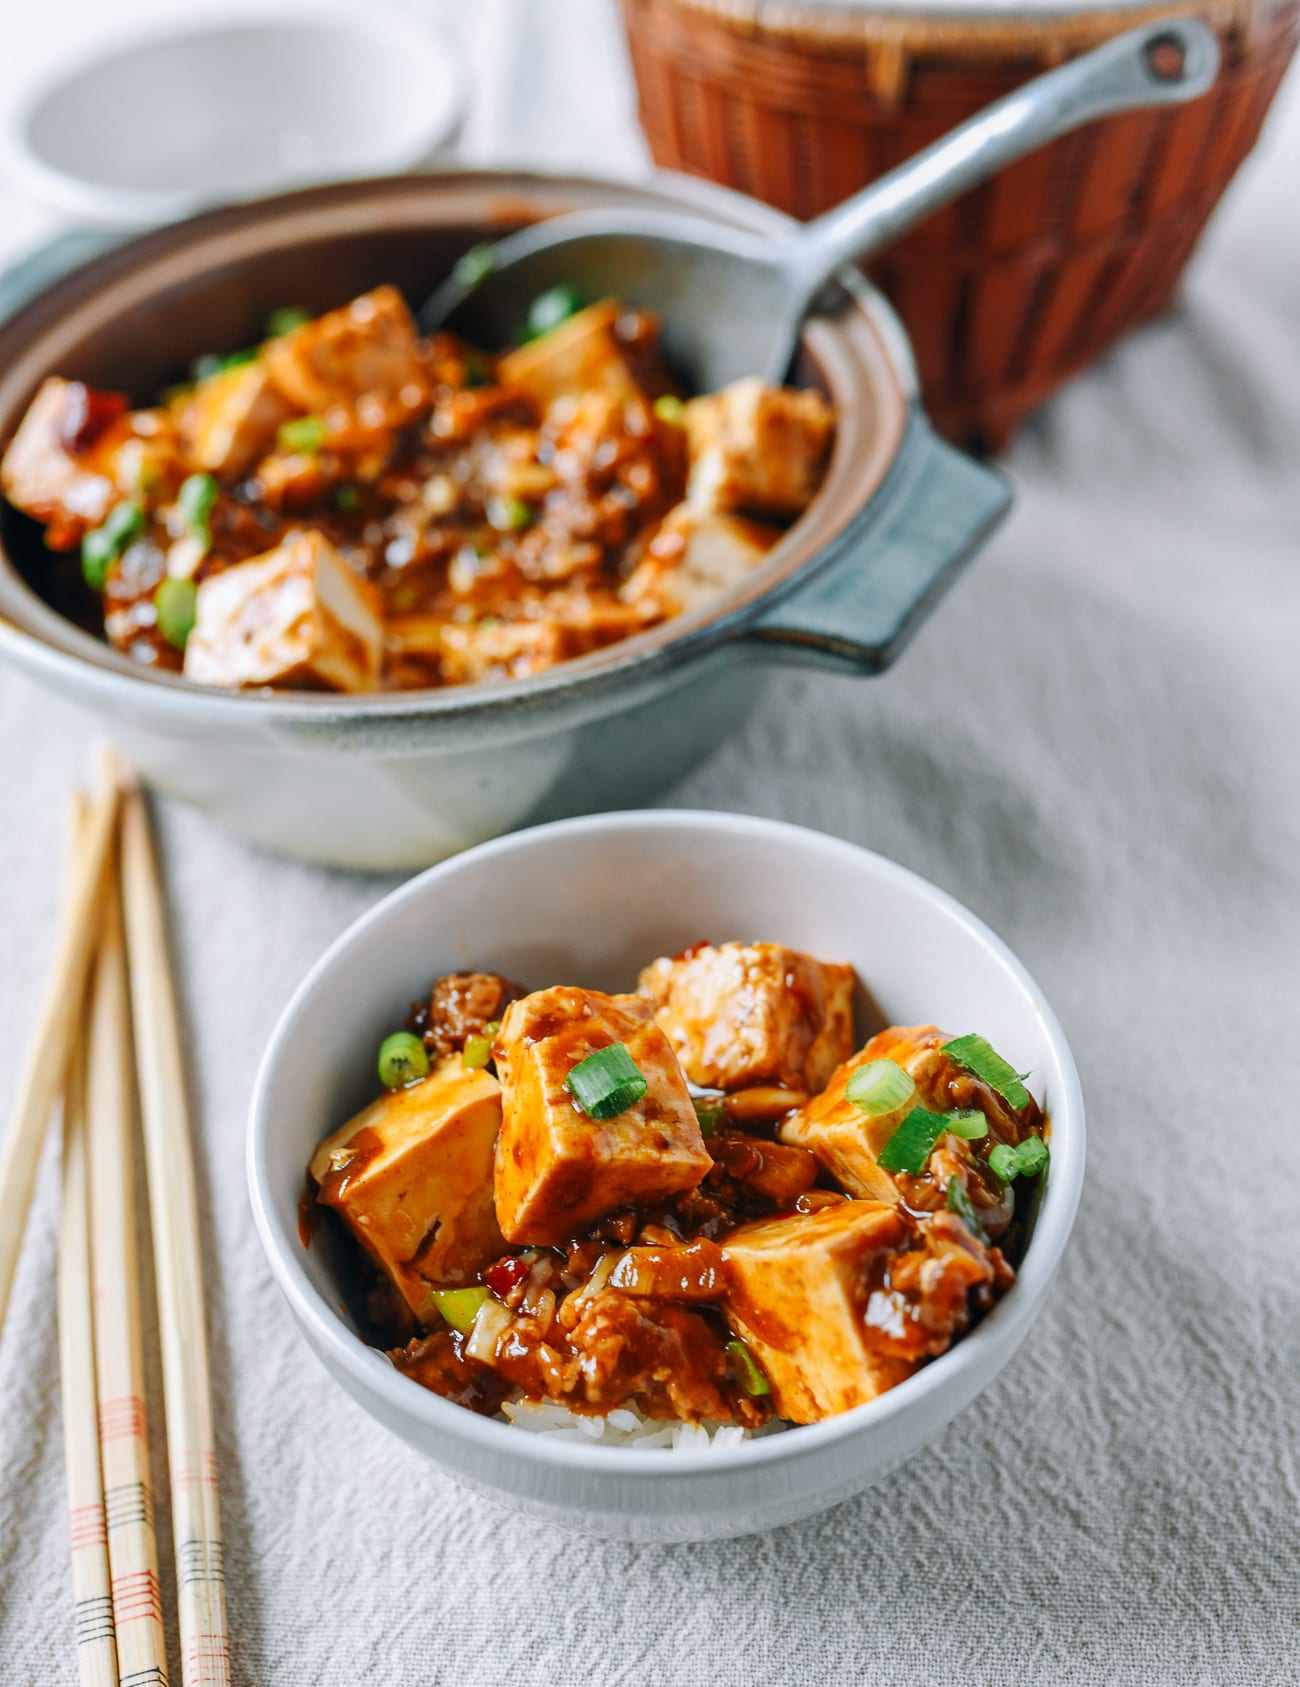 Bowl of Rice topped with garlic tofu